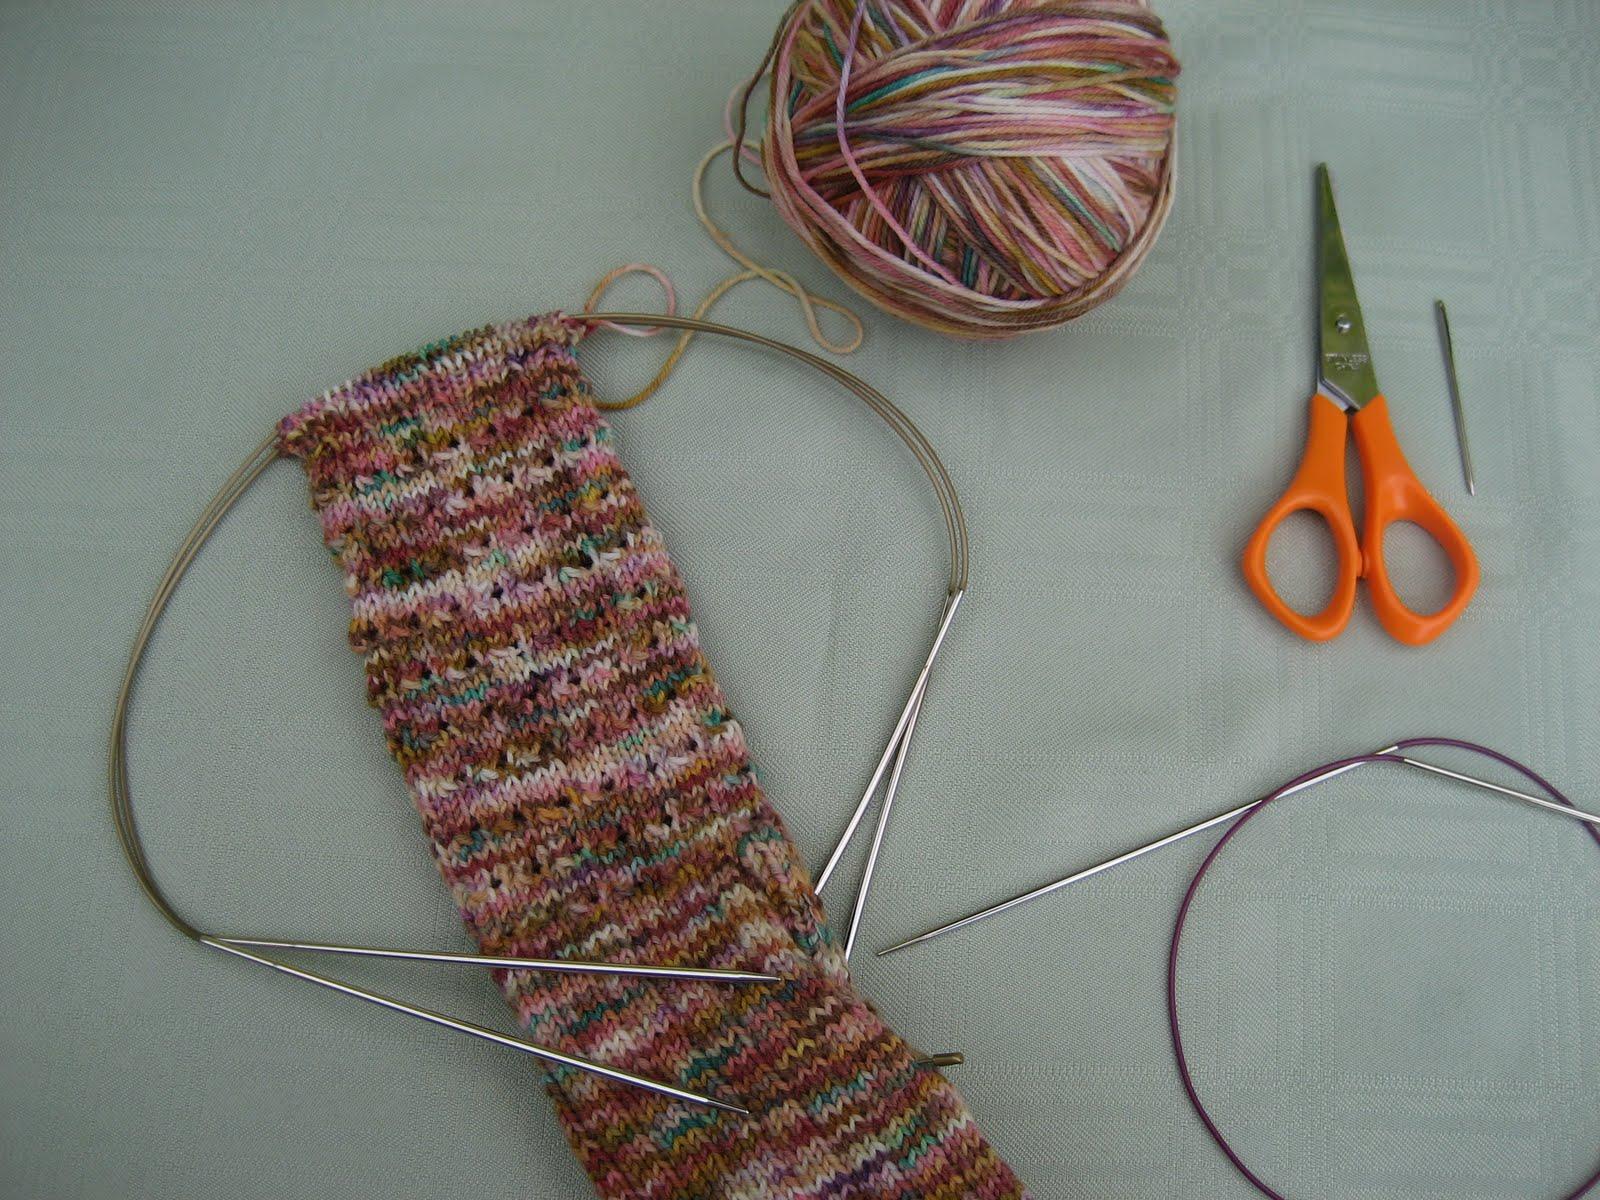 Kitchener Stitch With Knitting Needles : Carolyn Knits: Kitchener Stitch Bind-Off Tutorial